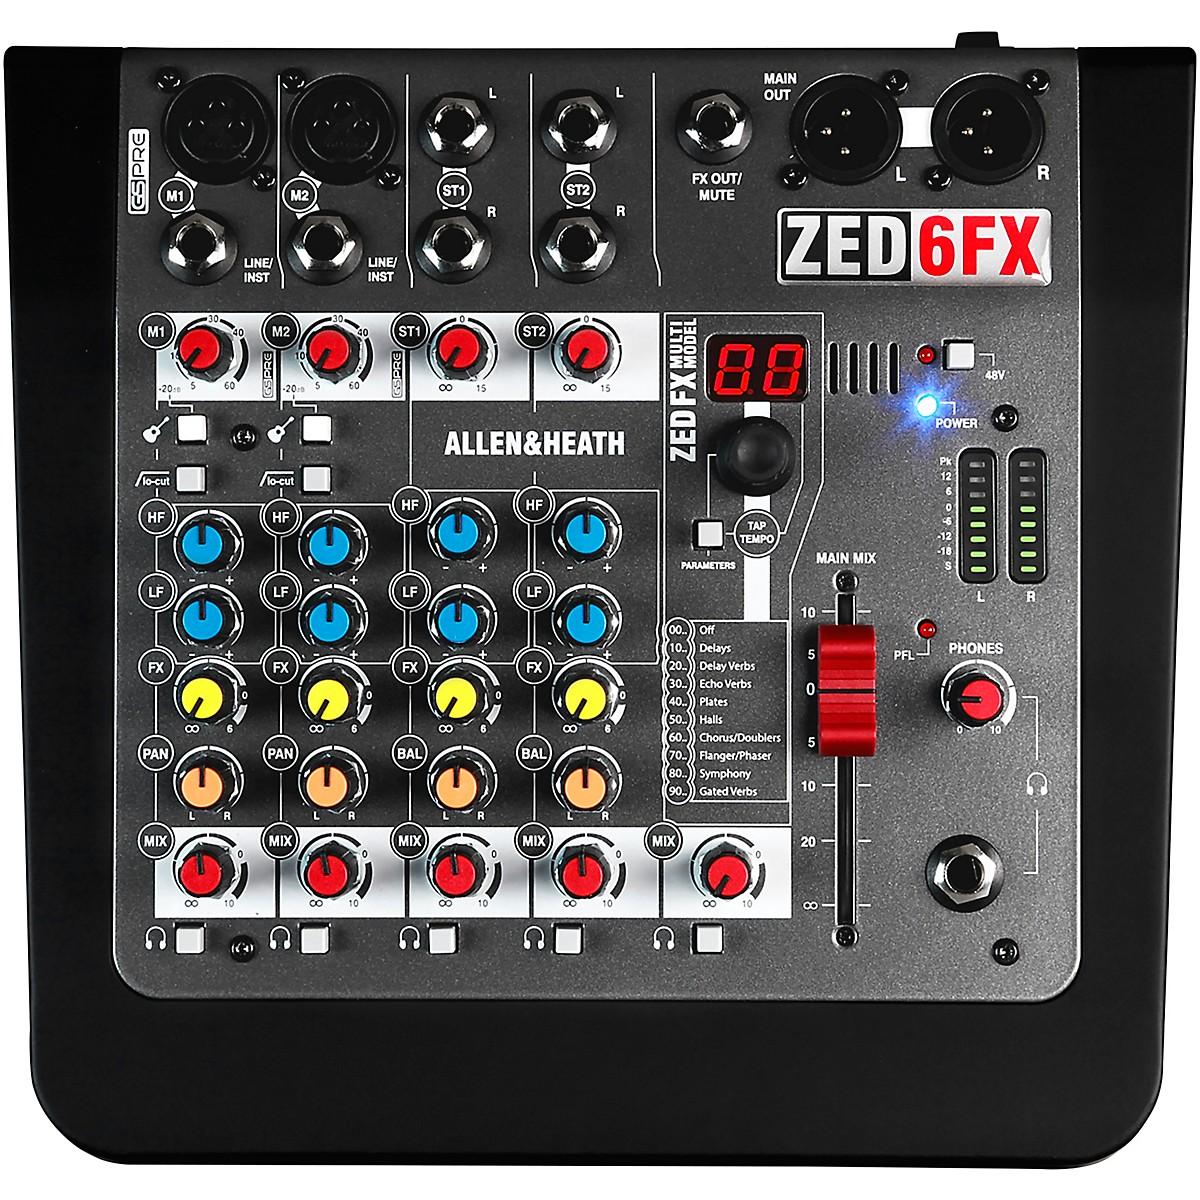 Allen & Heath AH-ZED6FX 6-Channel Mixer With FX